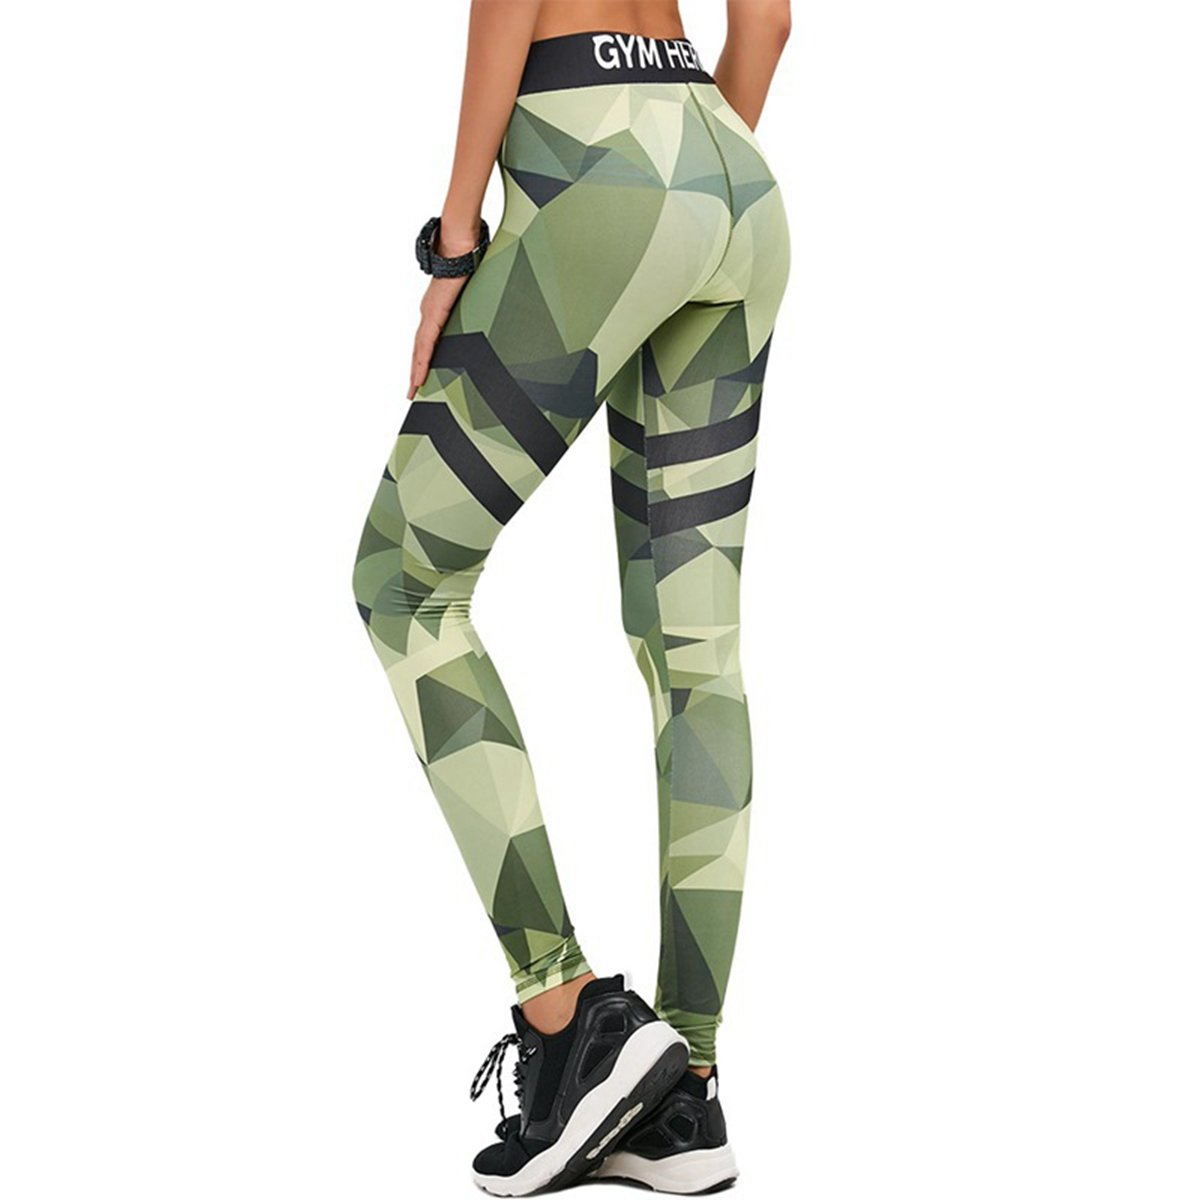 Edove PANTS レディース B075K6Q9PX Green|S S Green